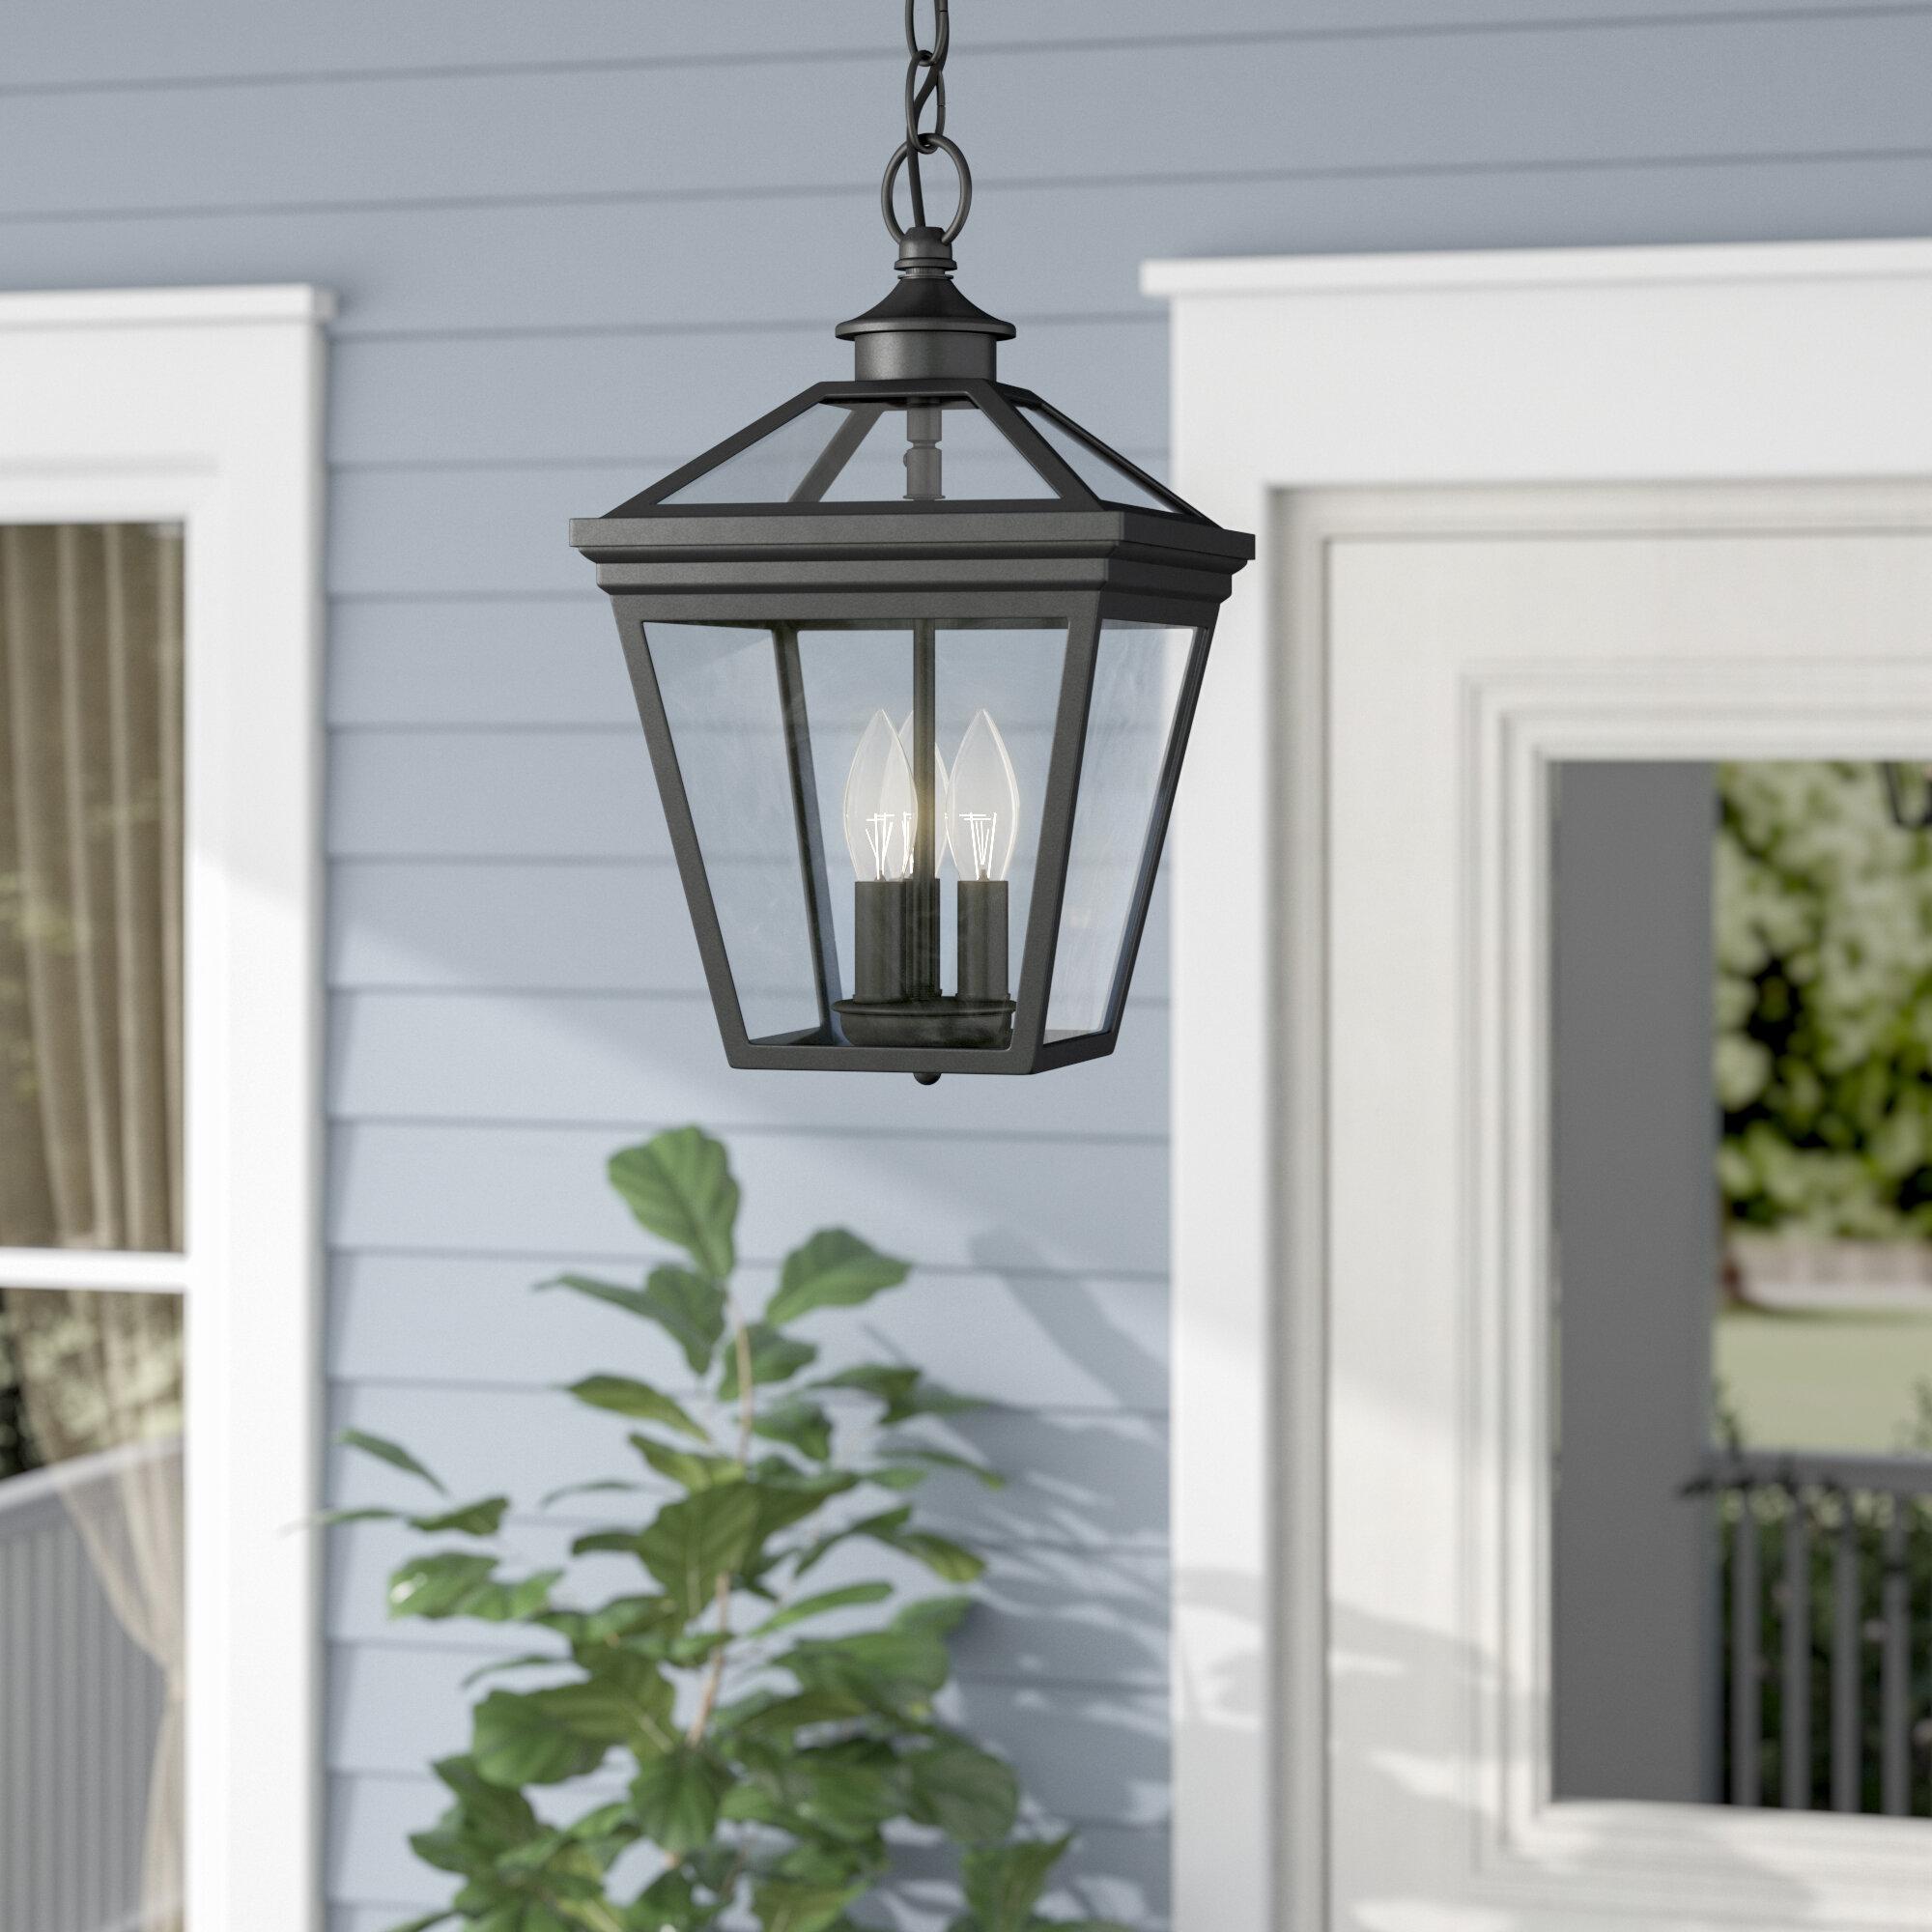 Darby Home Co Coleg 3-Light Outdoor Hanging Lantern & Reviews   Wayfair